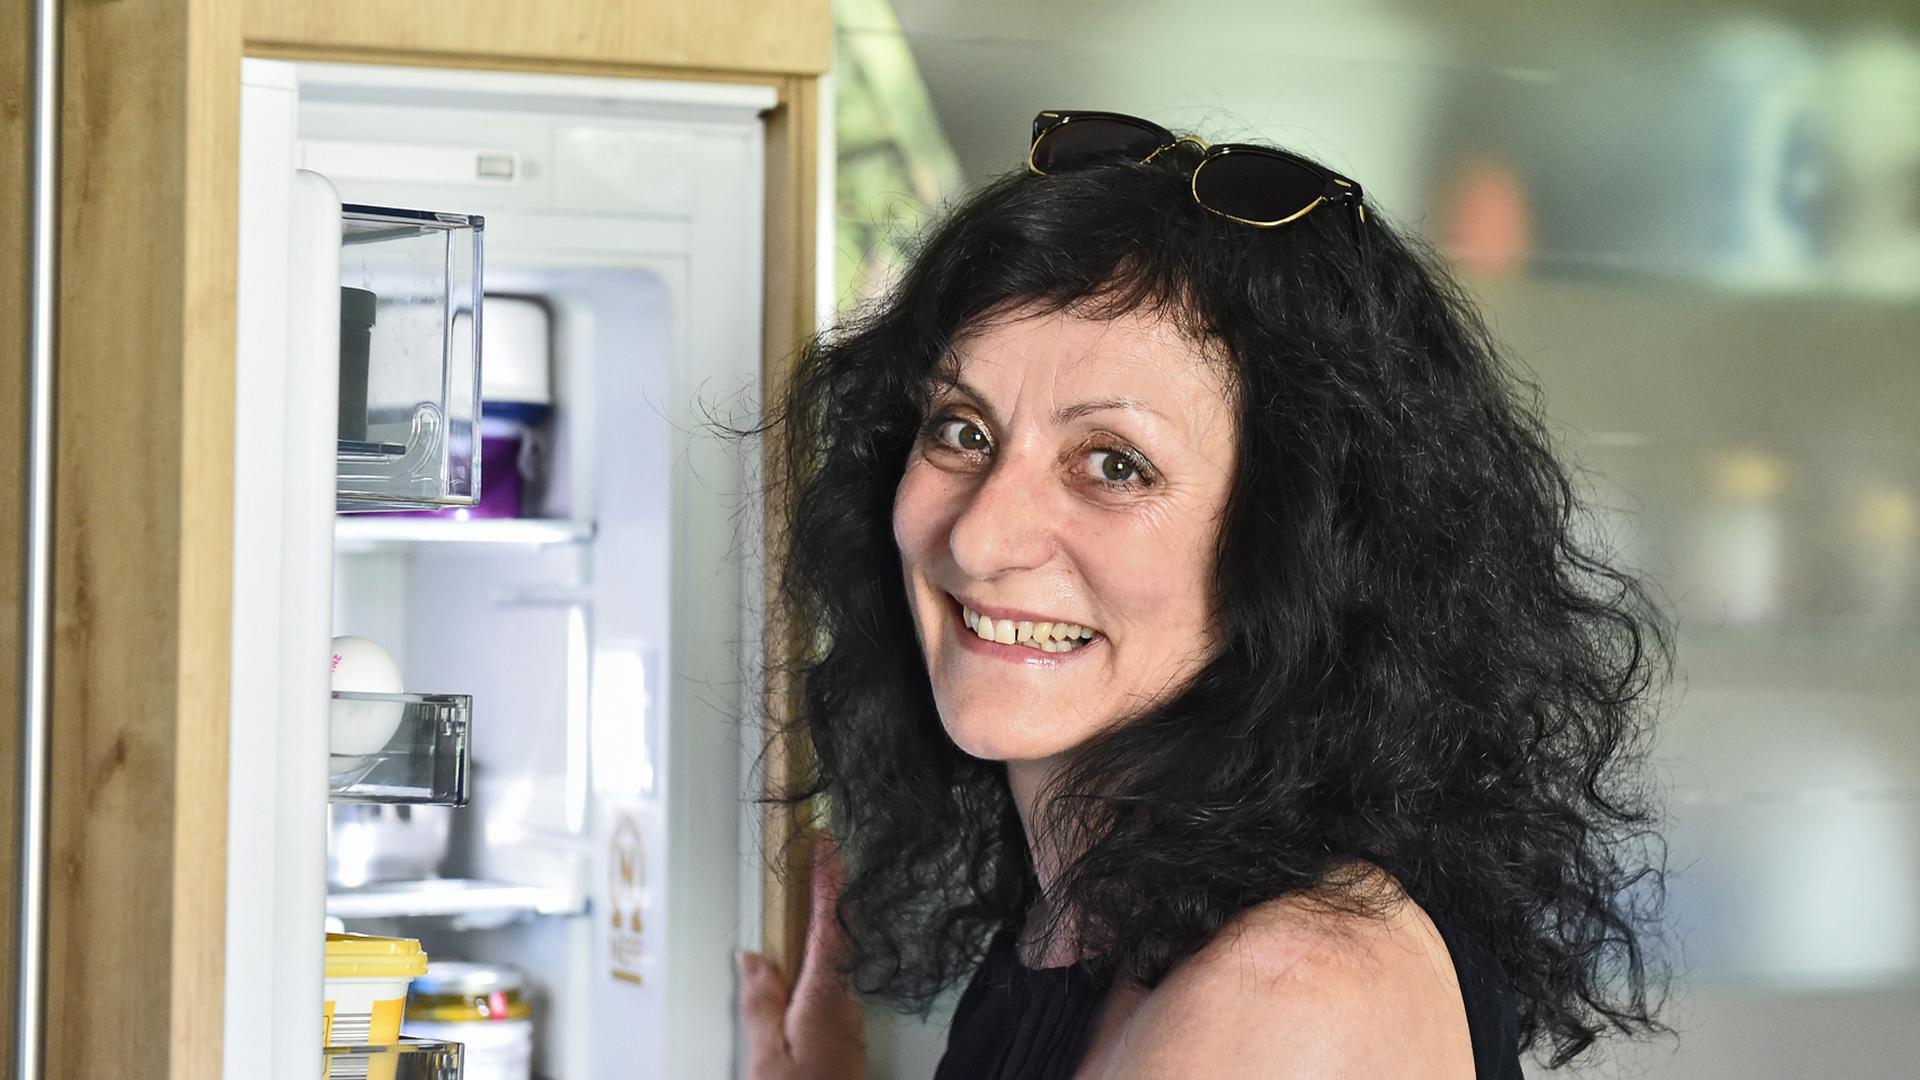 Buschenbacherin Kühlschrank Frau